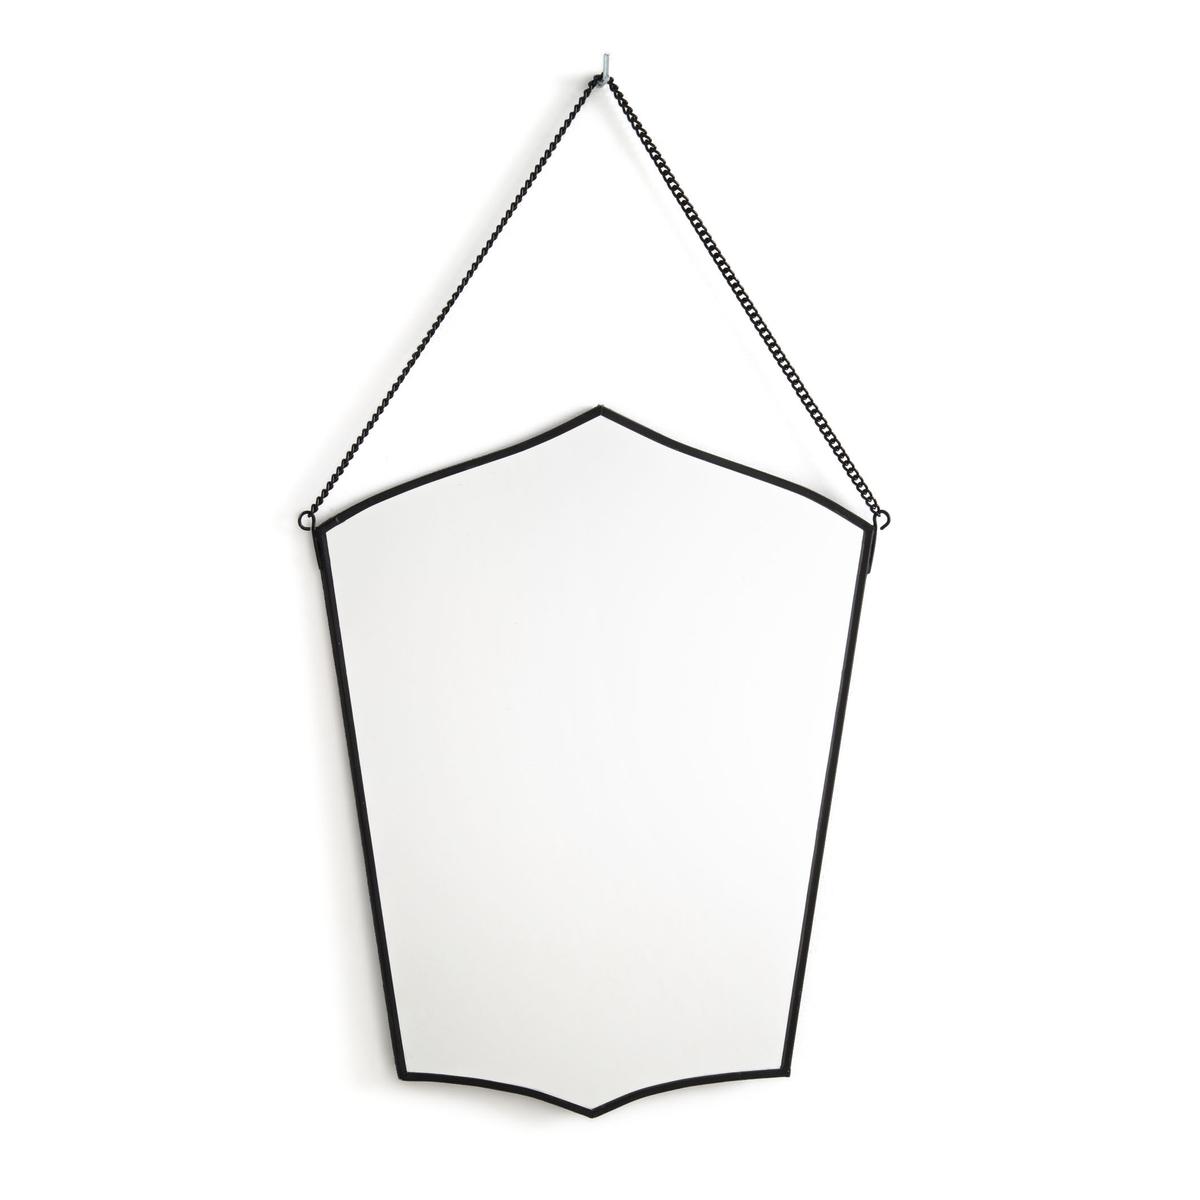 Зеркало La Redoute Из латуни Uyova единый размер черный зеркала la redoute uyova в форме домика единый размер желтый